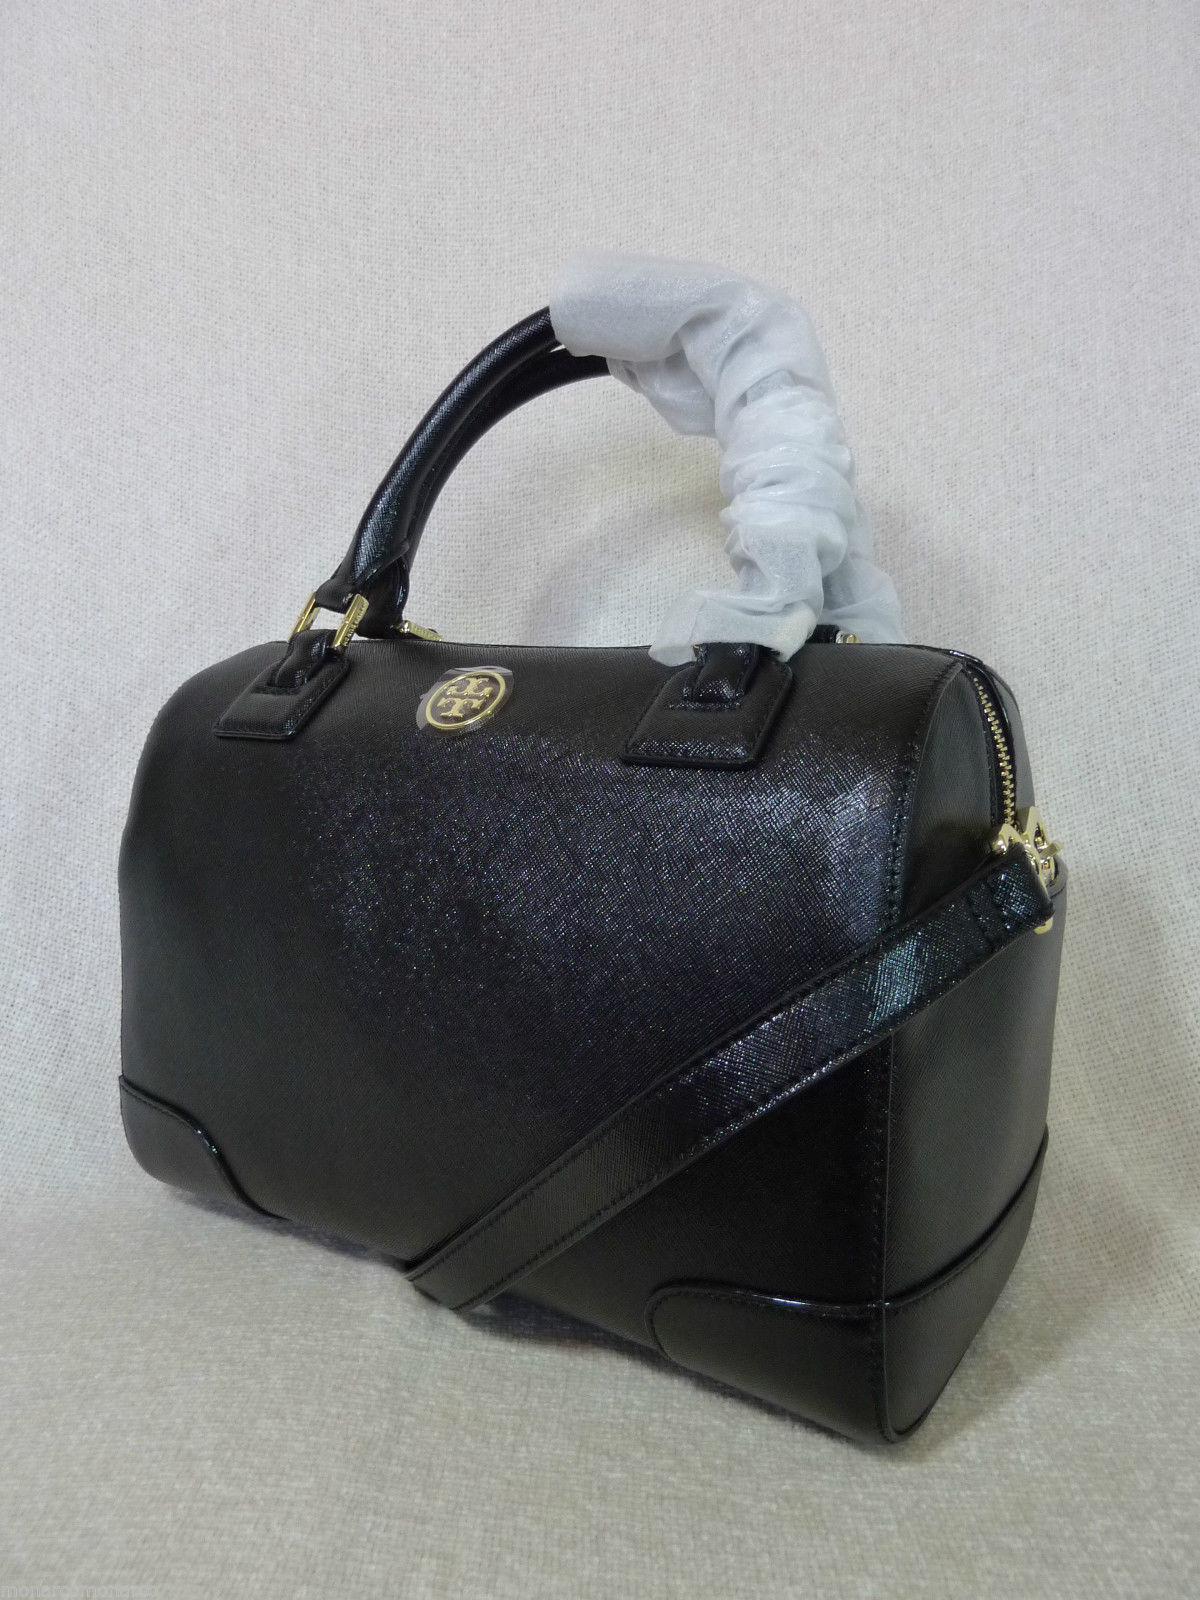 NWT Tory Burch Classic Black Saffiano Robinson Middy Satchel + Wallet $800 image 3